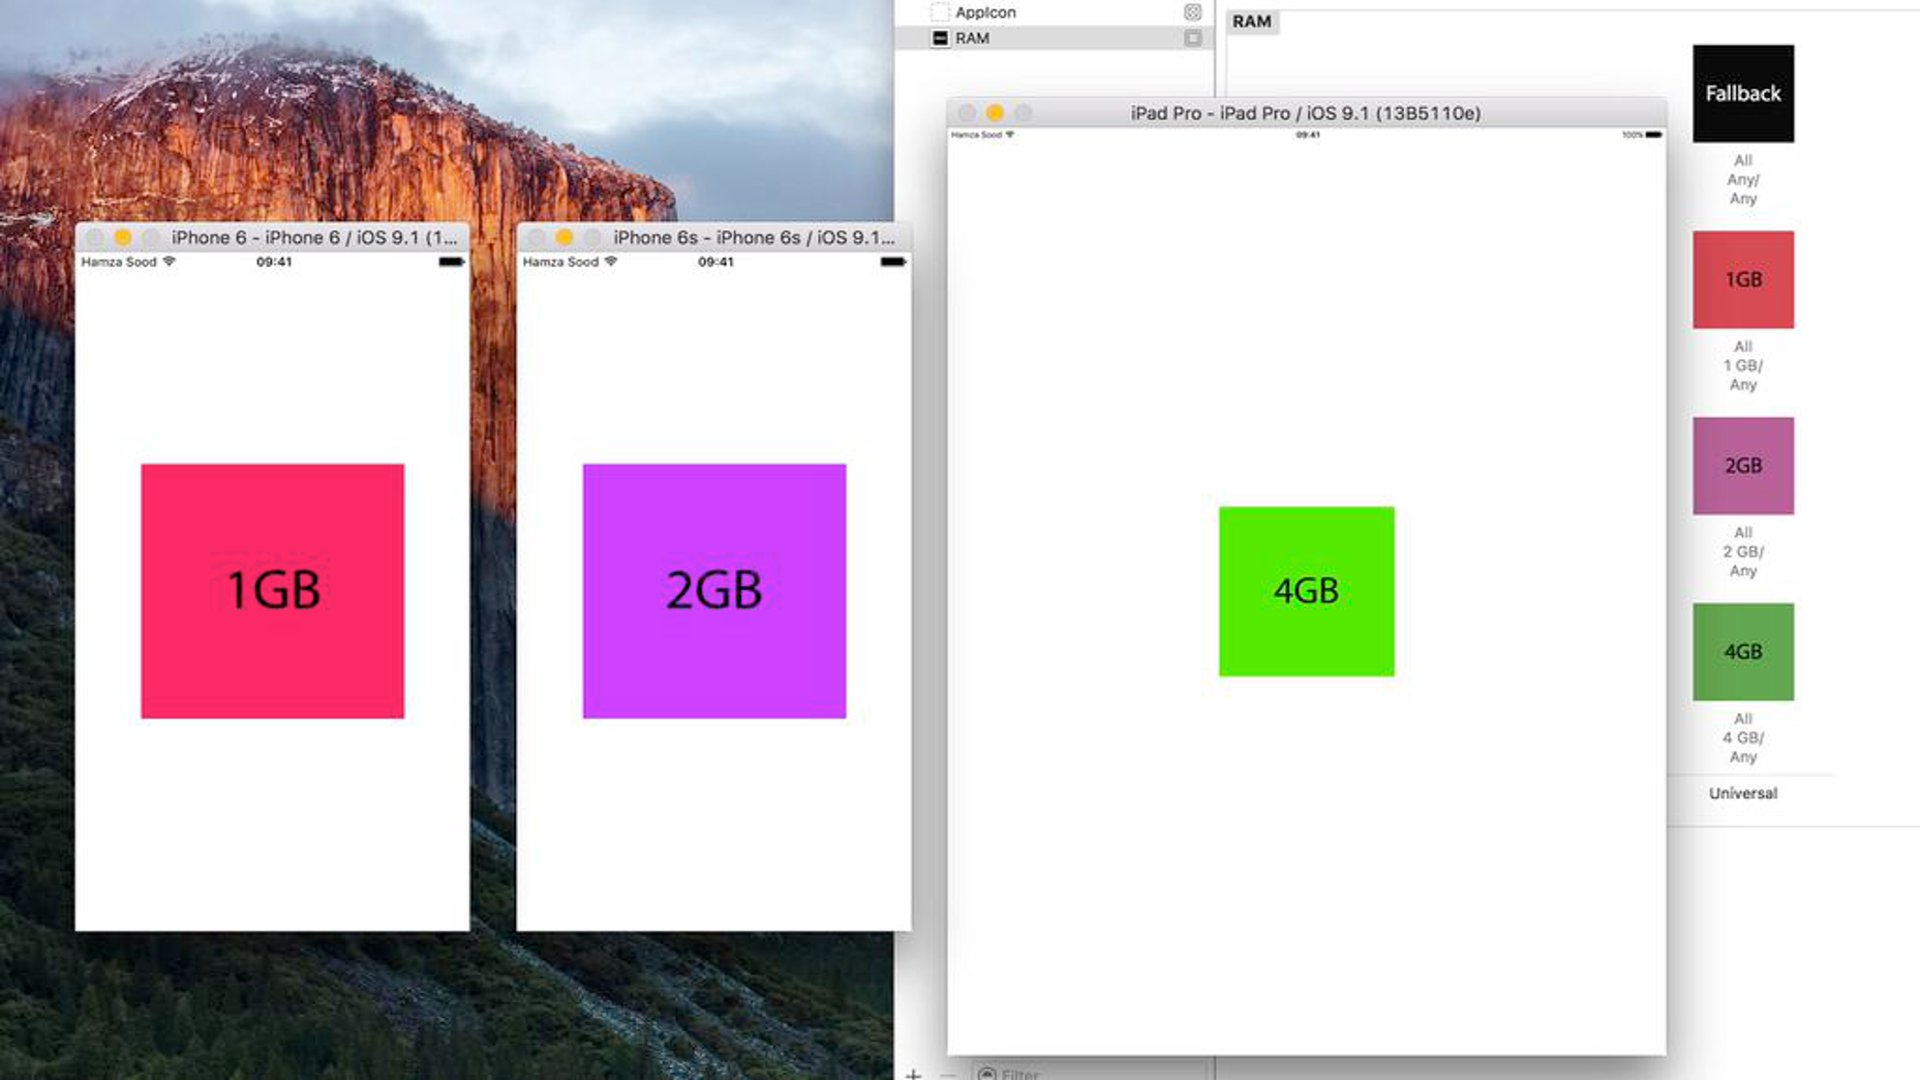 Xcode iOS Simulator - iPhone 6S, iPhone 6S Plus And iPad Pro RAM